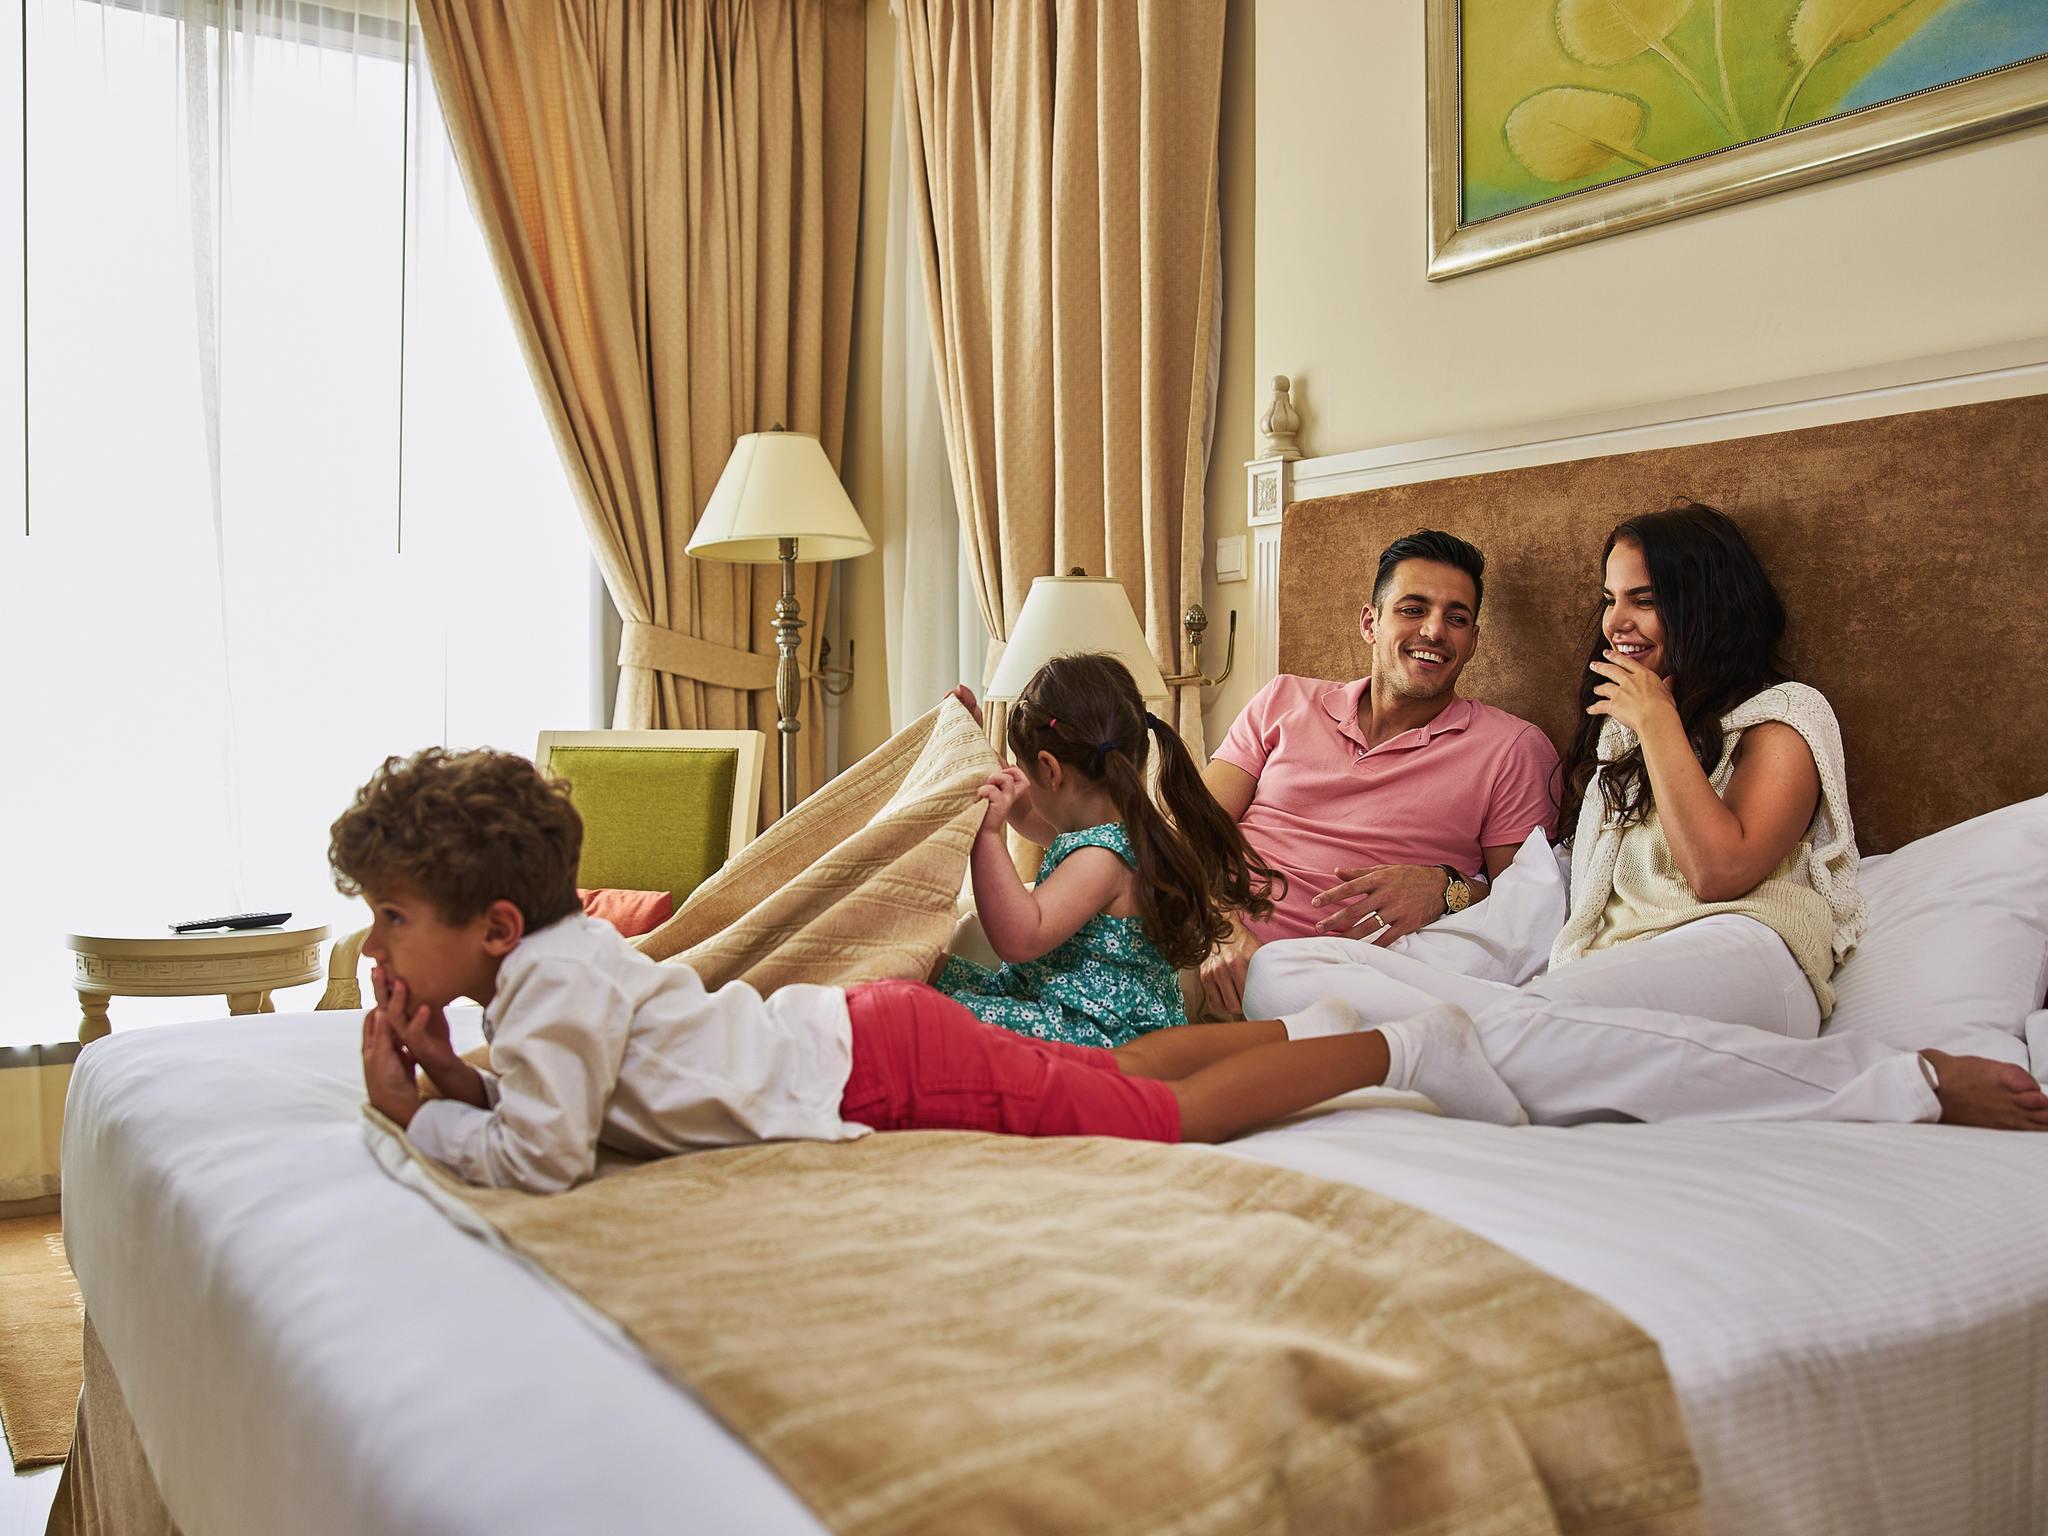 فندق - شقق فندق مركيور Mercure دبي برشا هايتس